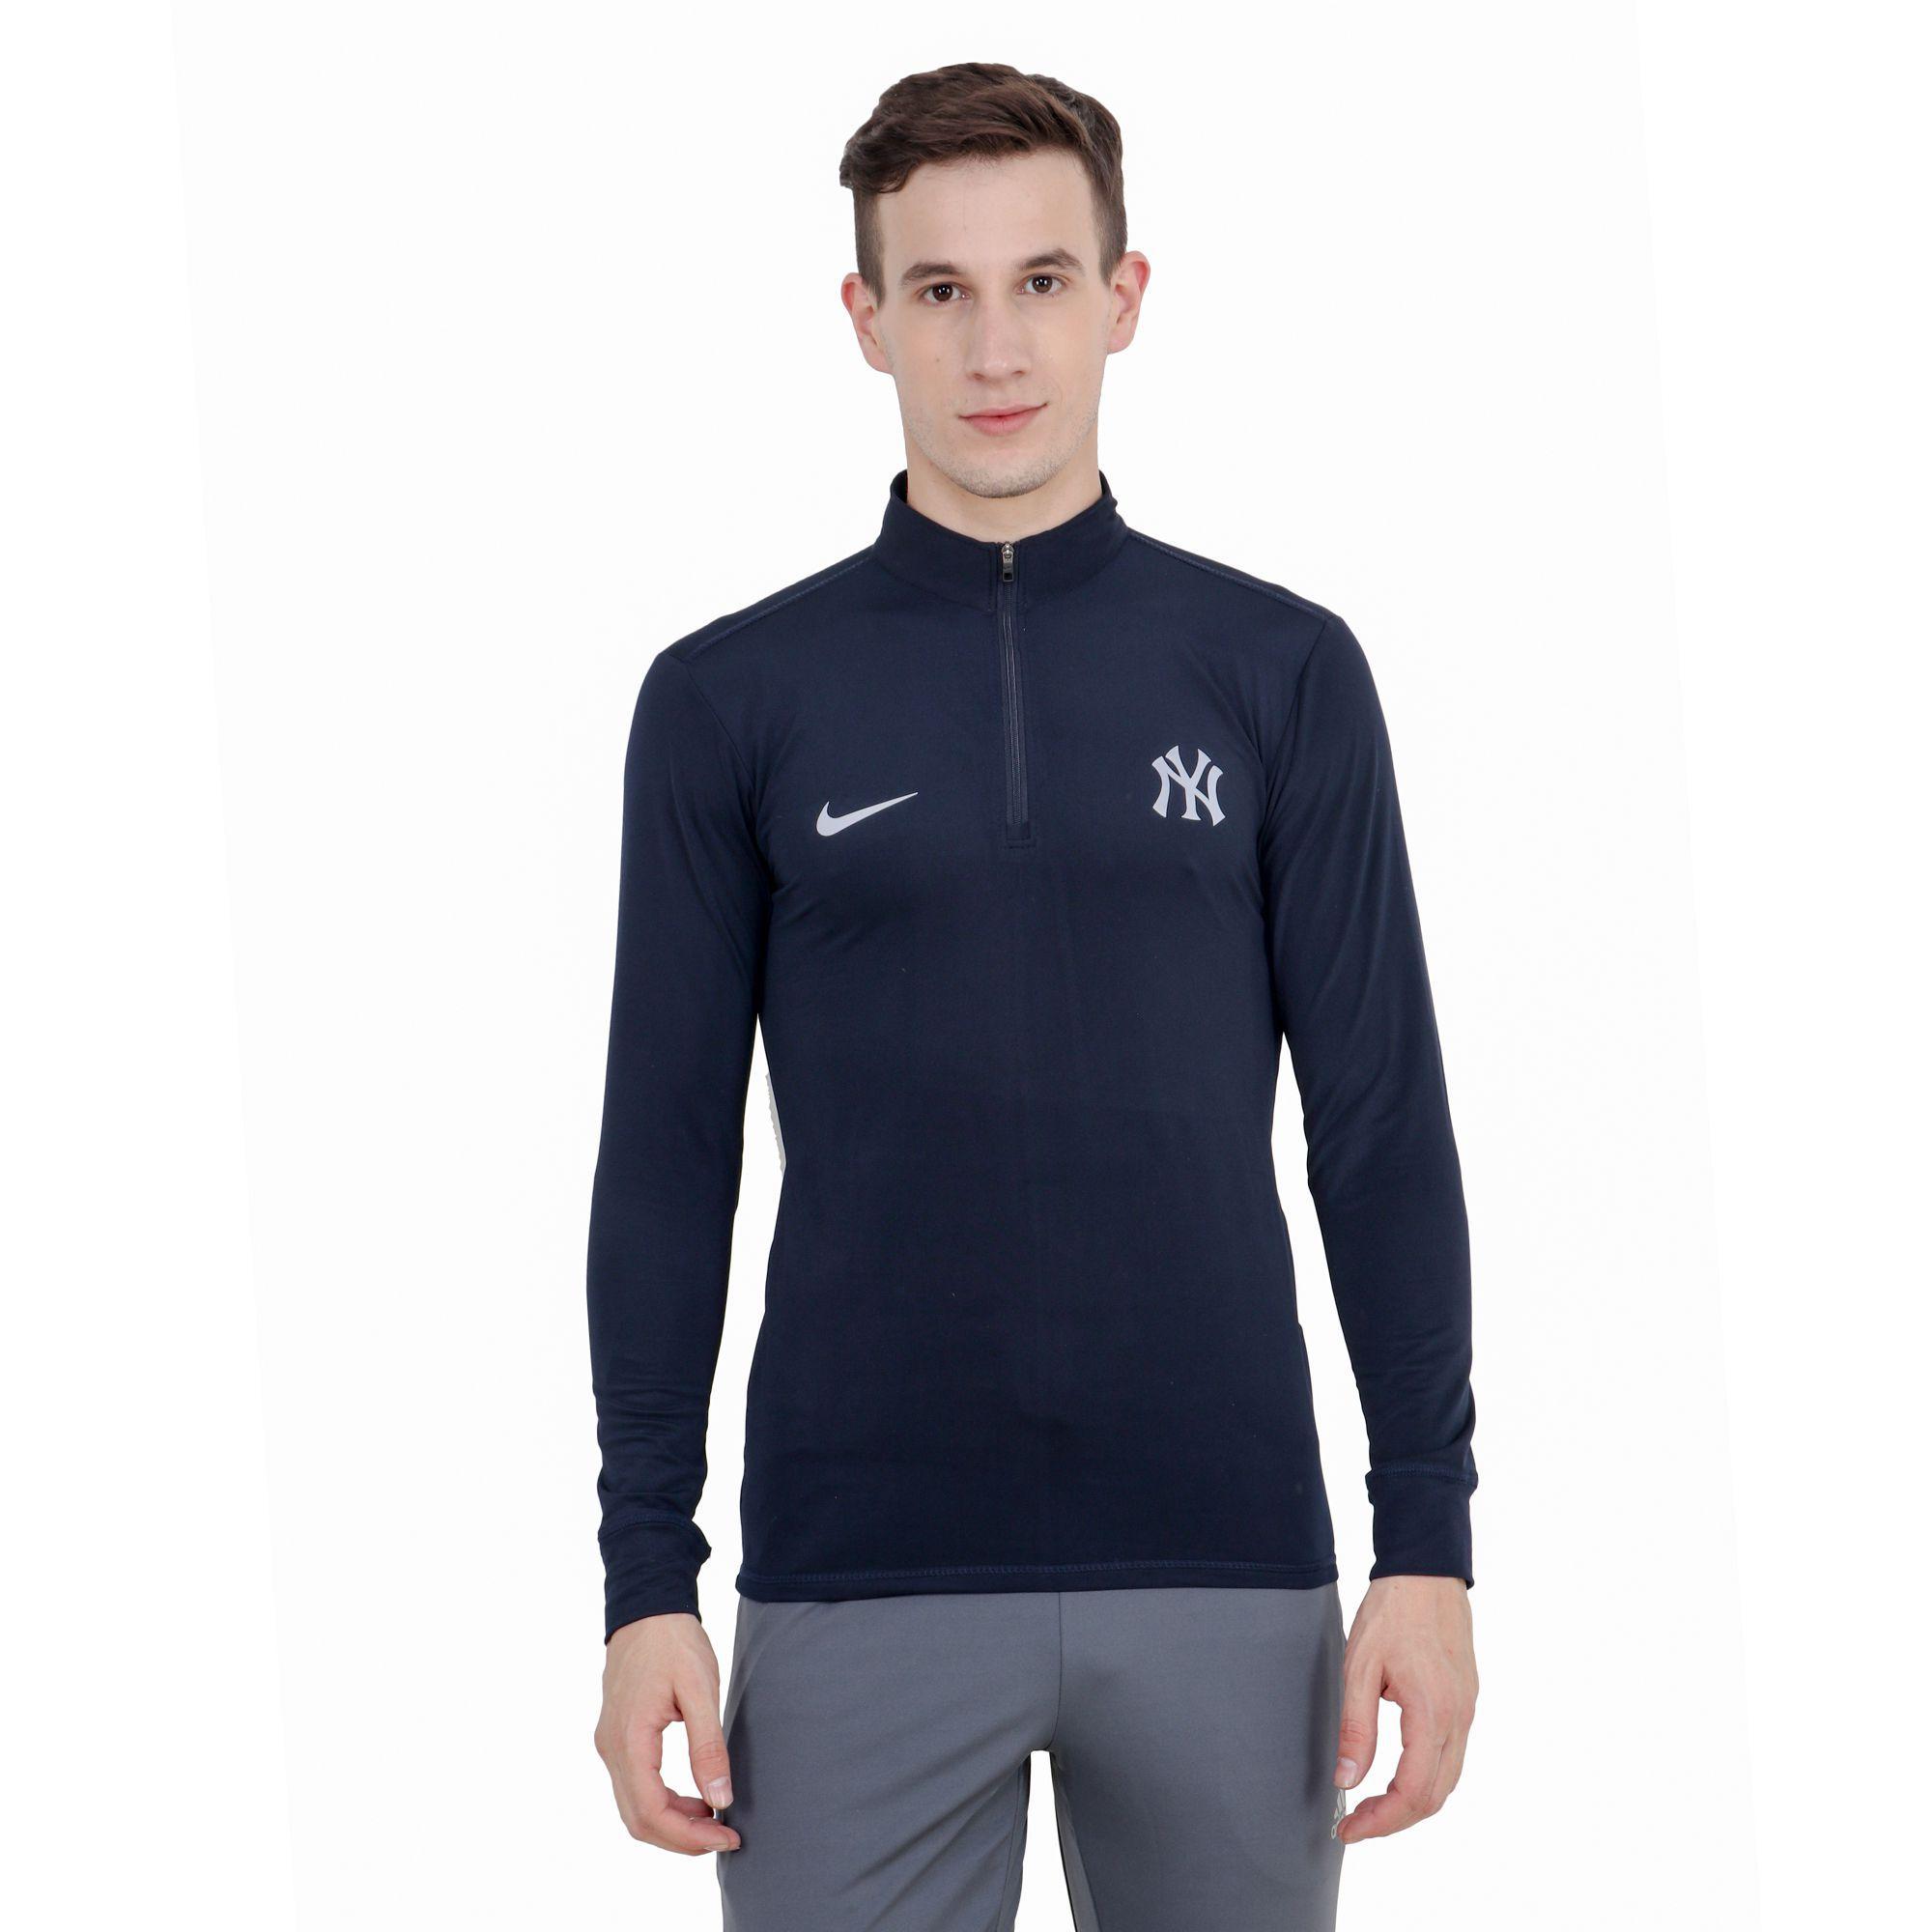 Nike Navy Polyester Lycra T-Shirt